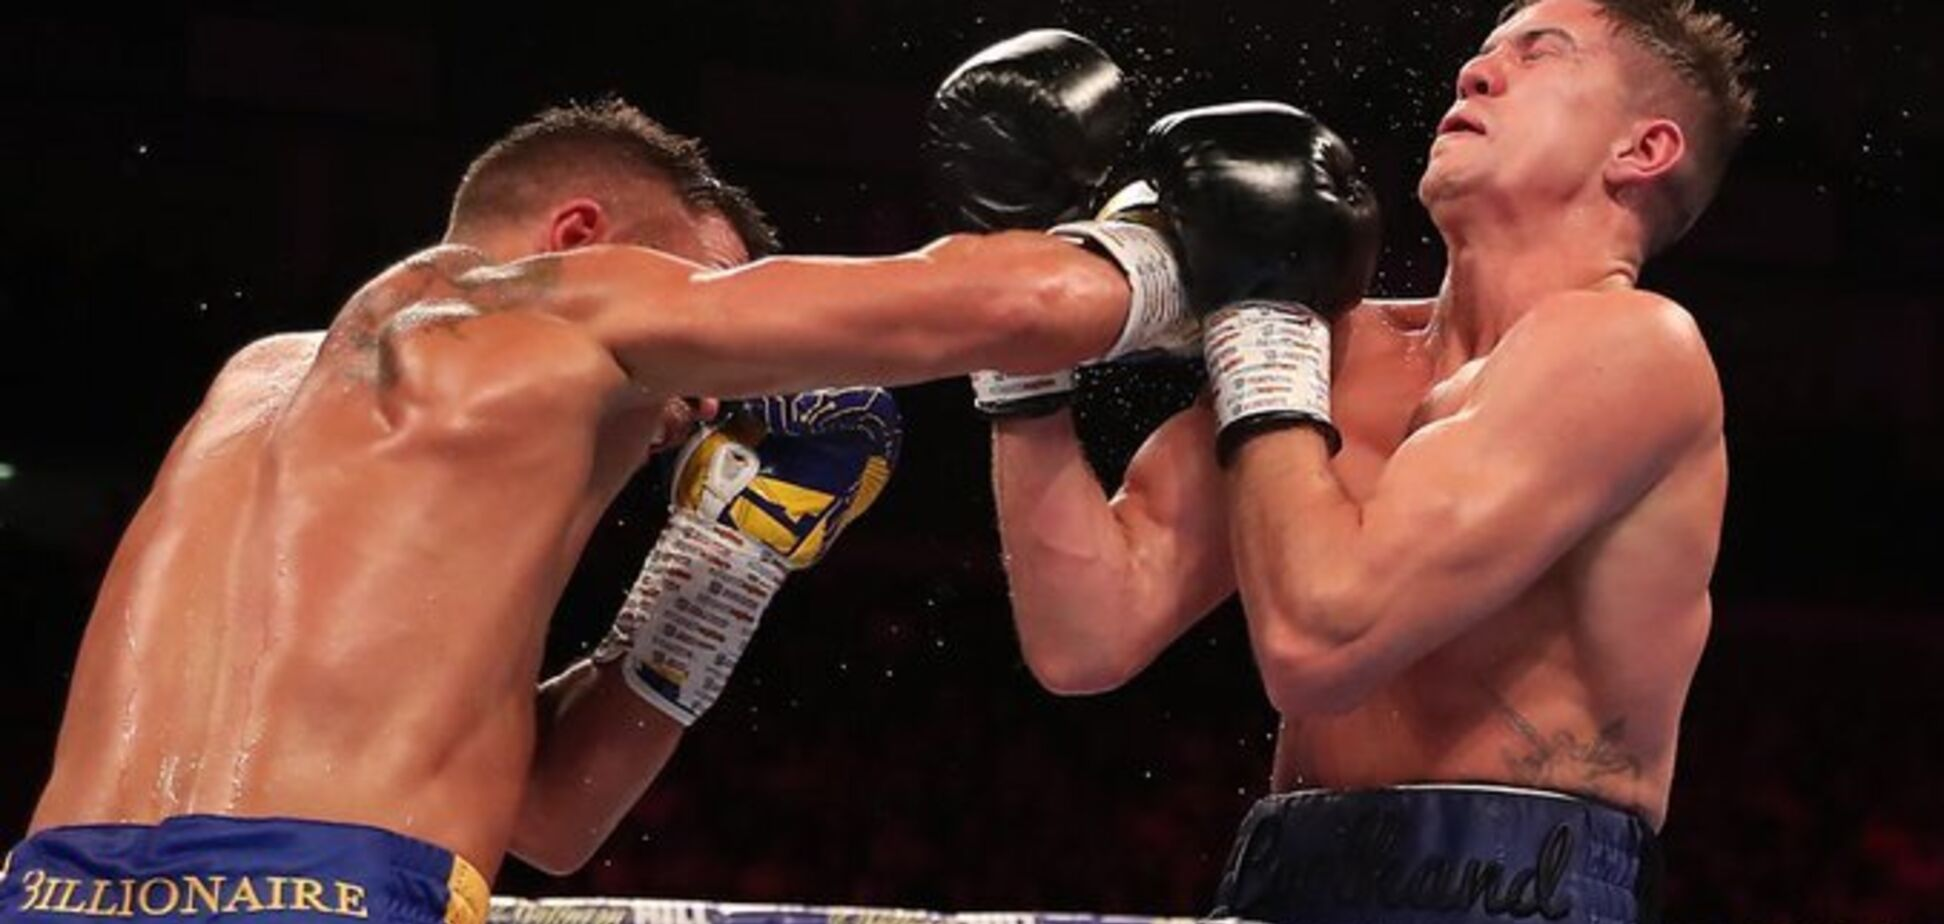 Ломаченко победил в ярком бою с нокдауном, завоевав третий чемпионский титул